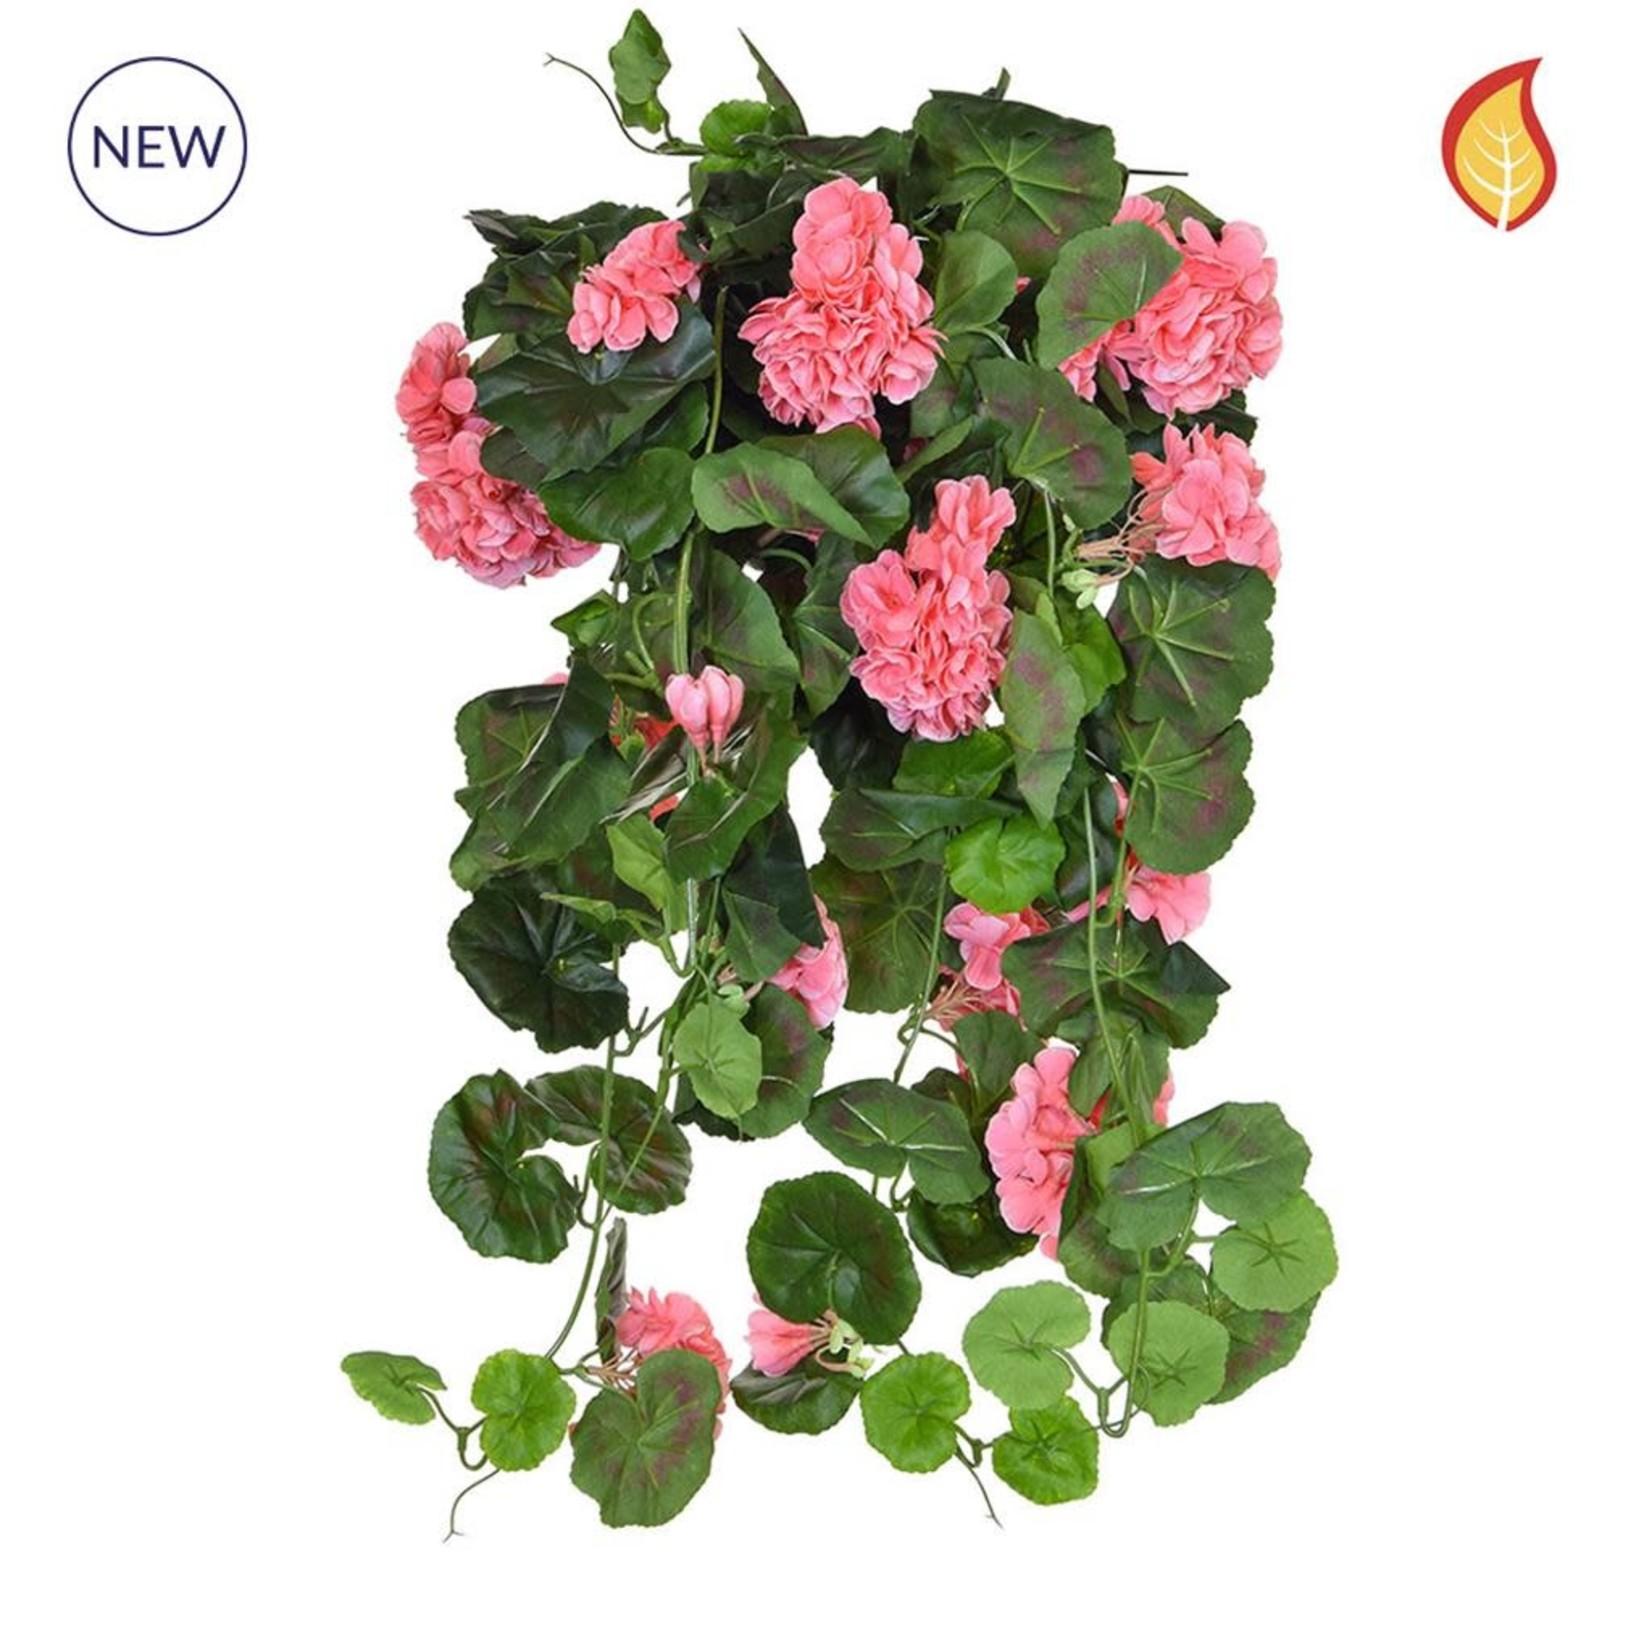 I & T Geranium Vine Pink DB 73cm - Fire Rated